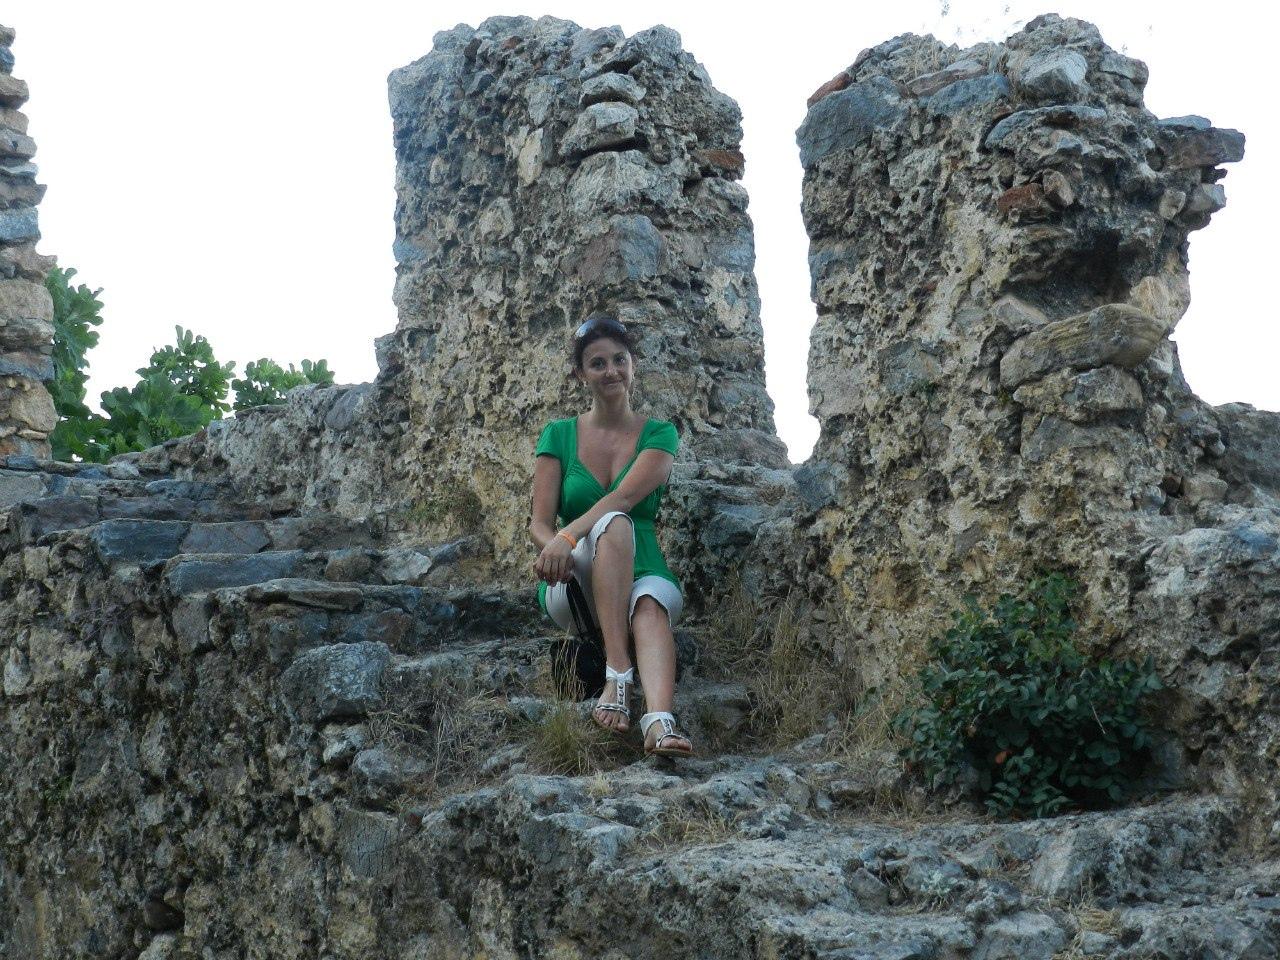 photo from album of Svetlana Gileva №6